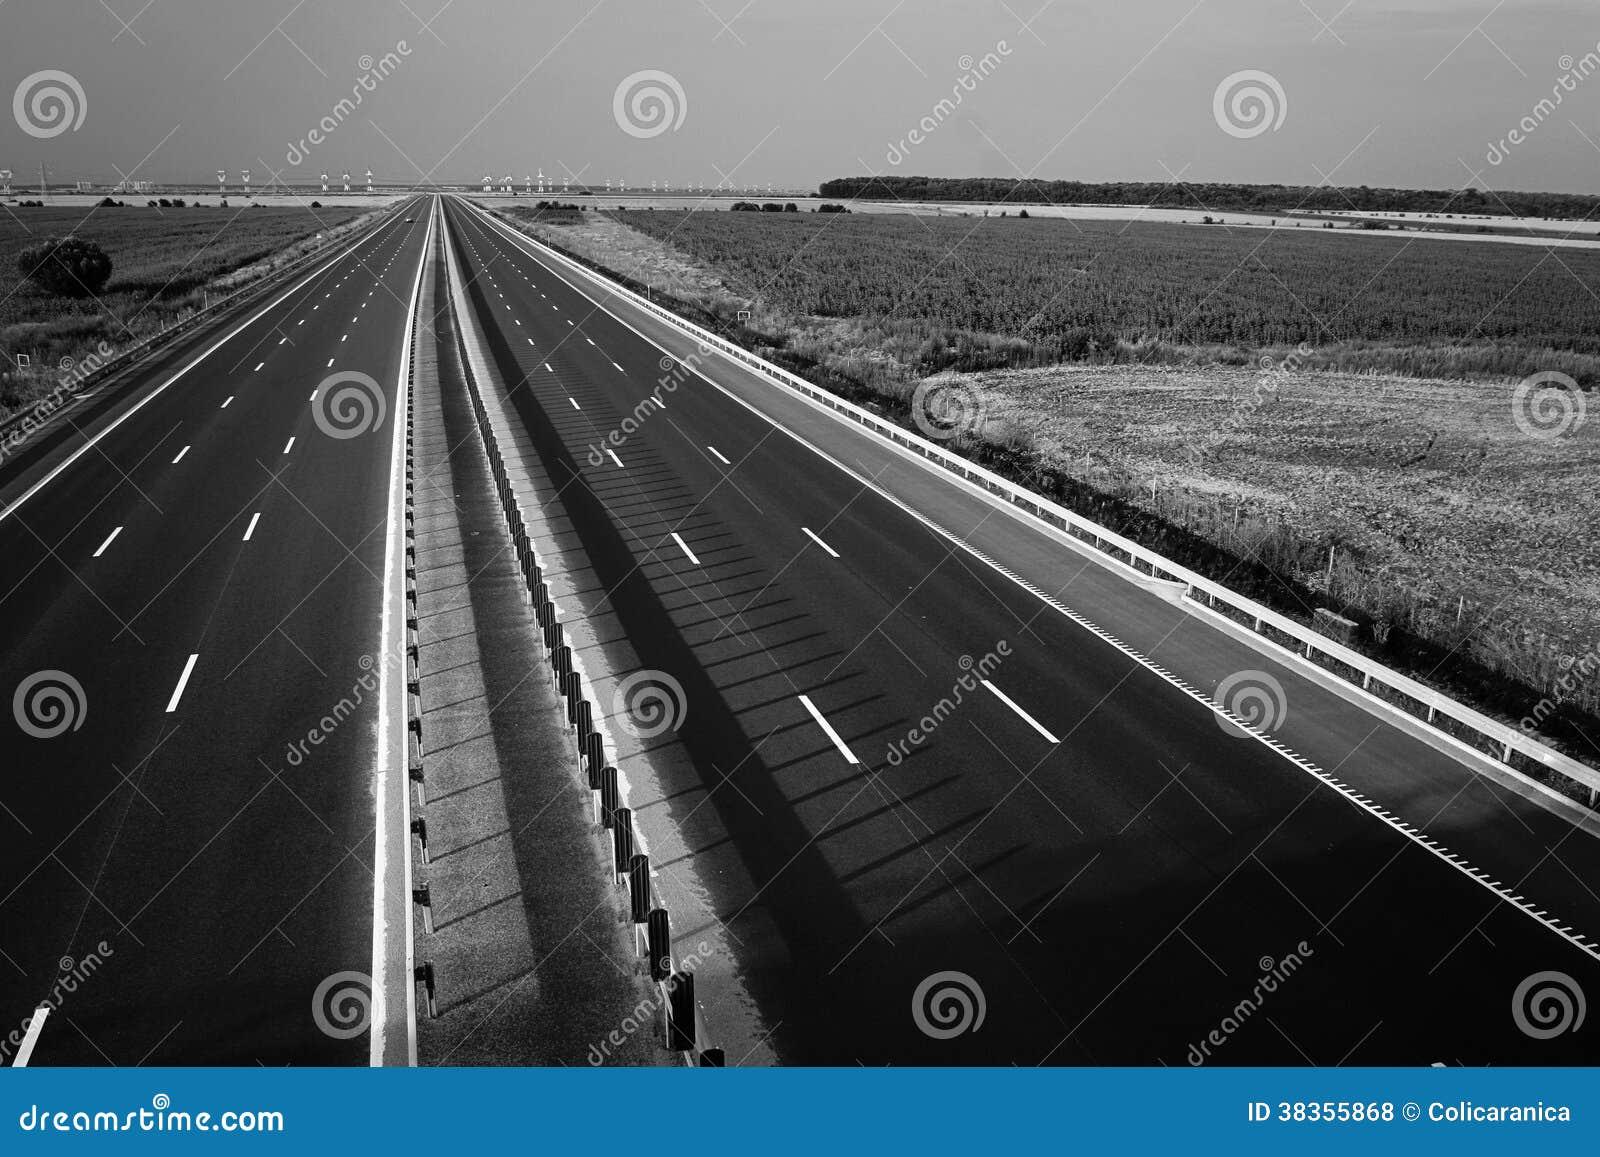 Motorway seen from above